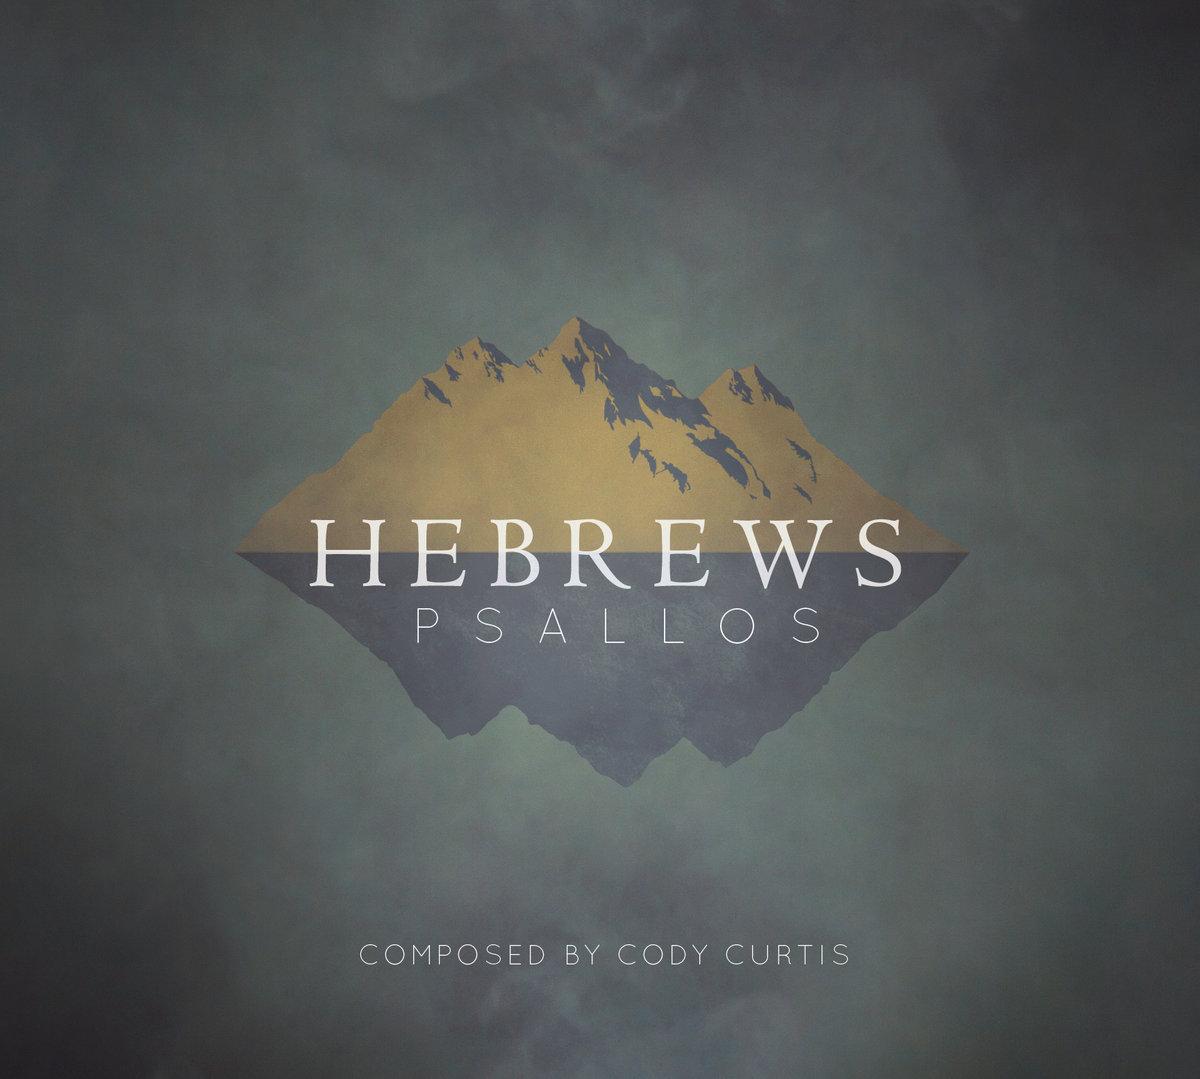 Death and Melchizedek (7:1-28) | PSALLOS